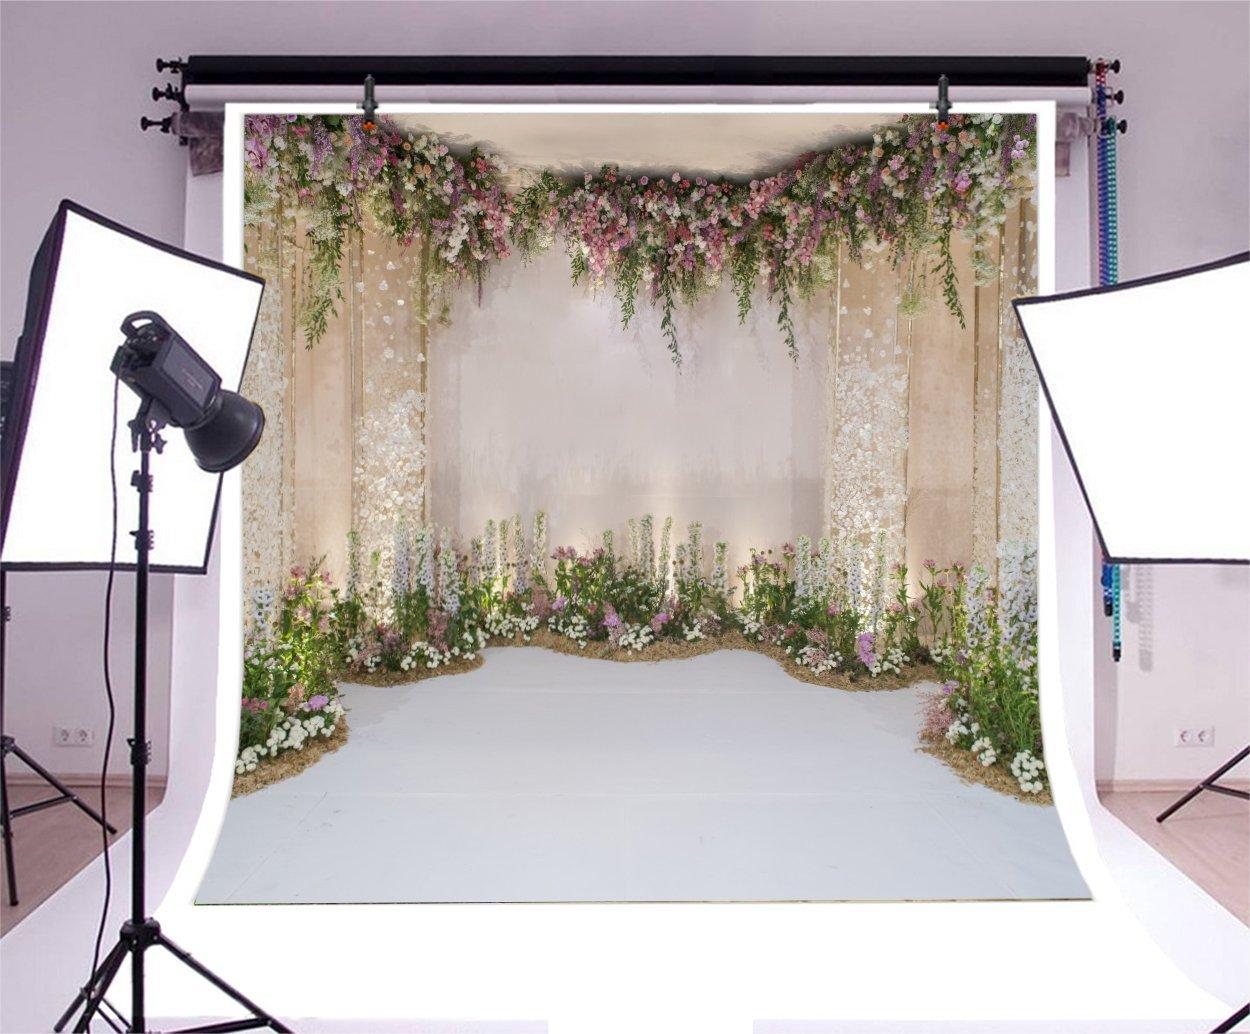 Amazon.com : AOFOTO 10x10ft Arch for Wedding Ceremony Backdrop ...